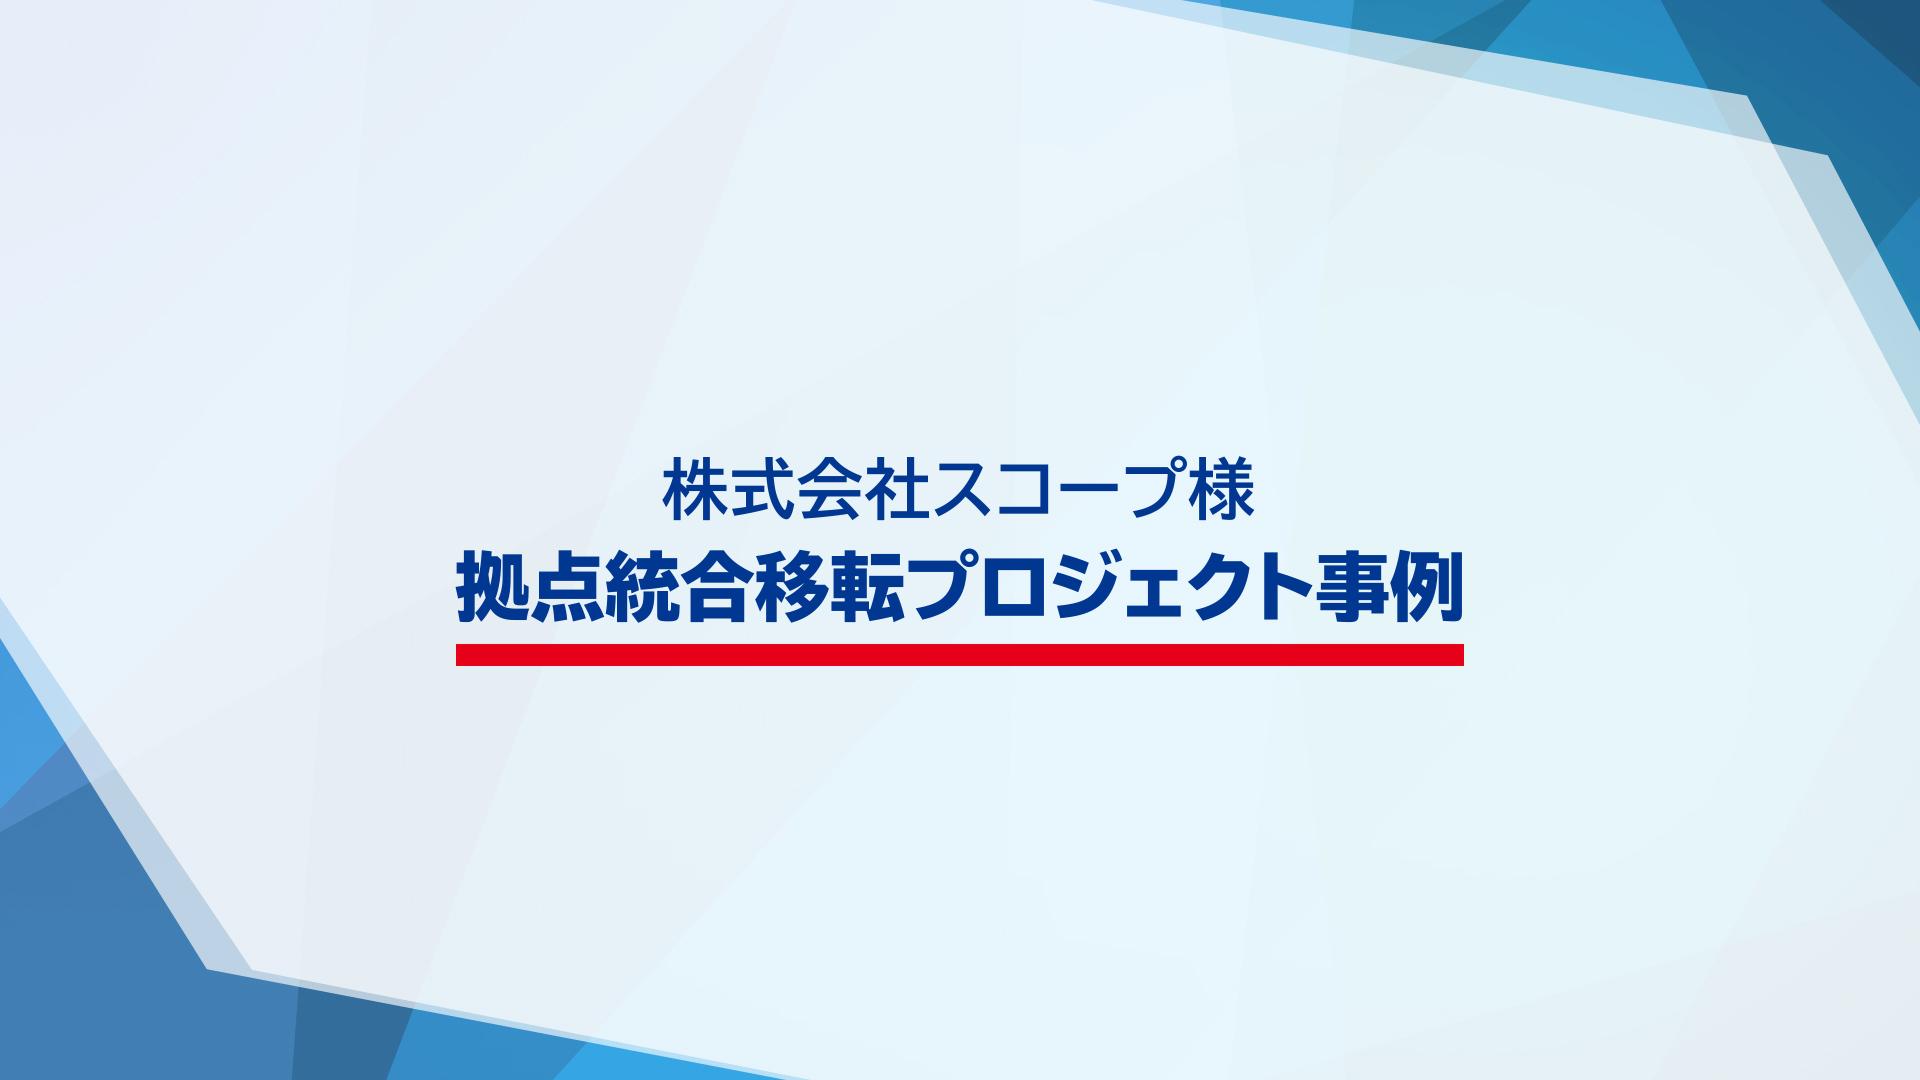 【VP】NECネッツエスアイ「EmpoweredOffice」(2019/9min)